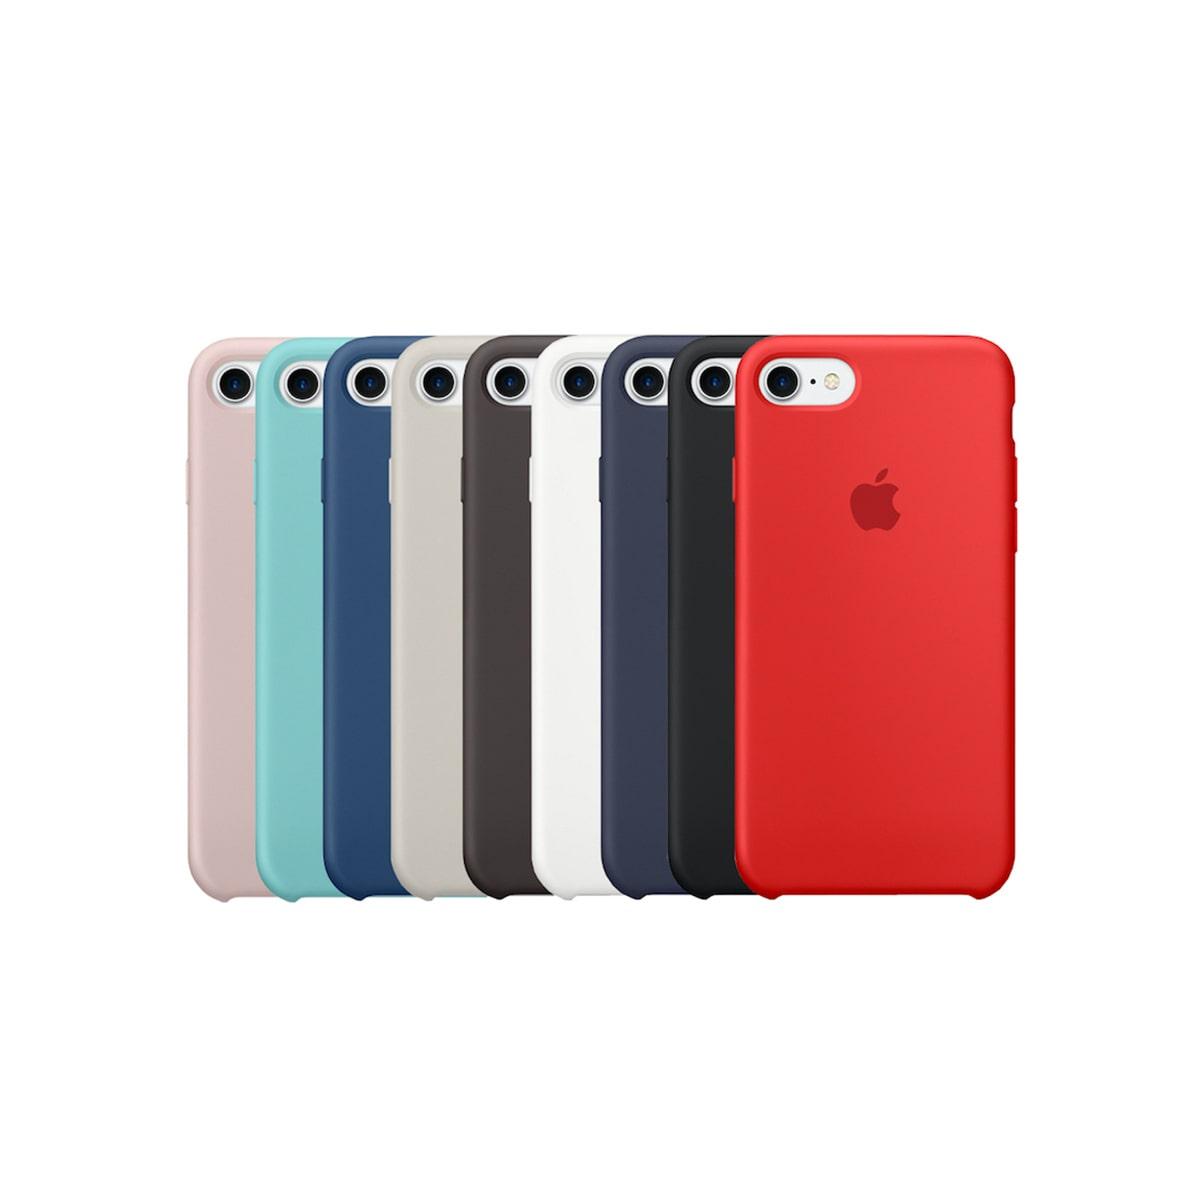 Apple iPhone 7/8 custodia in silicone (Nuovo)